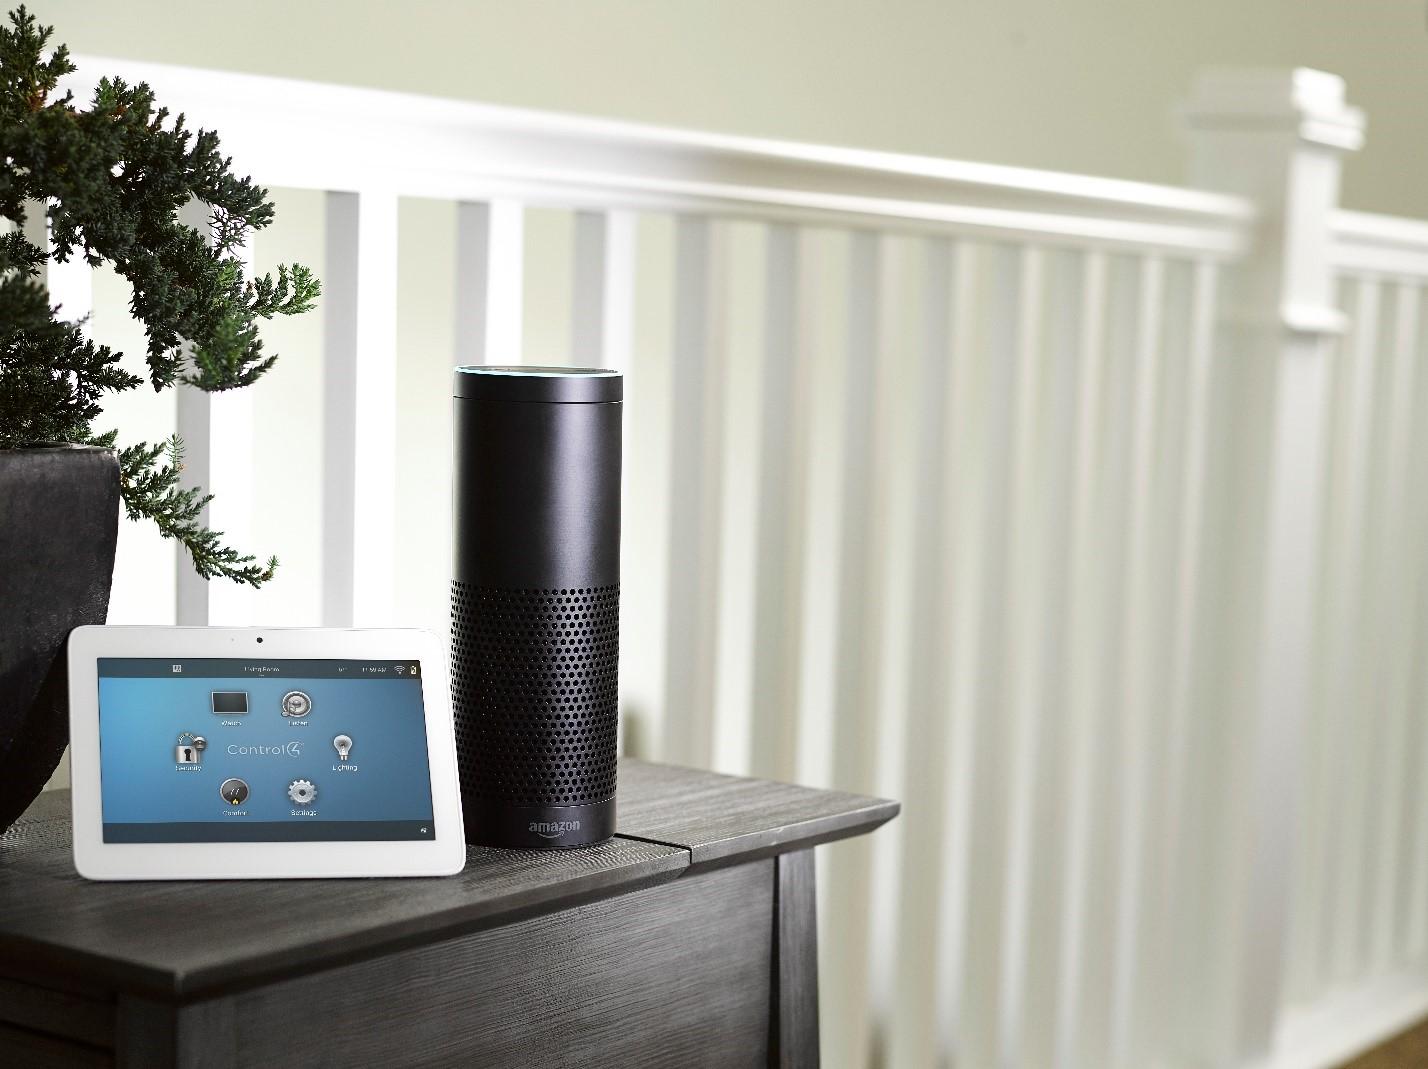 Enjoy Hands-free Automation with Amazon's Alexa